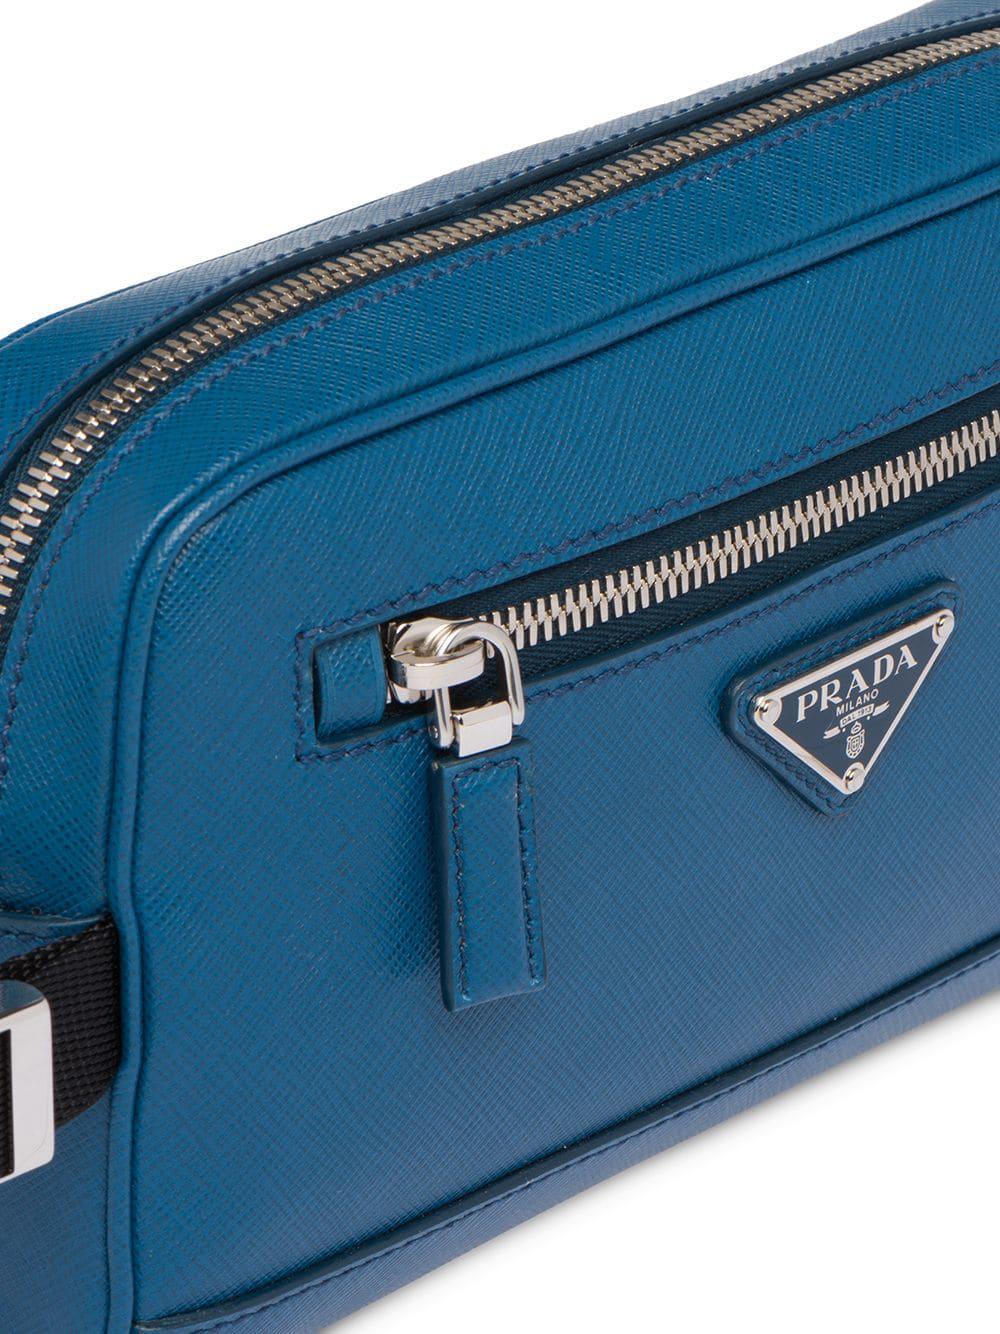 a5dcfc4fc35c Prada - Blue Saffiano Leather Belt Bag for Men - Lyst. View fullscreen